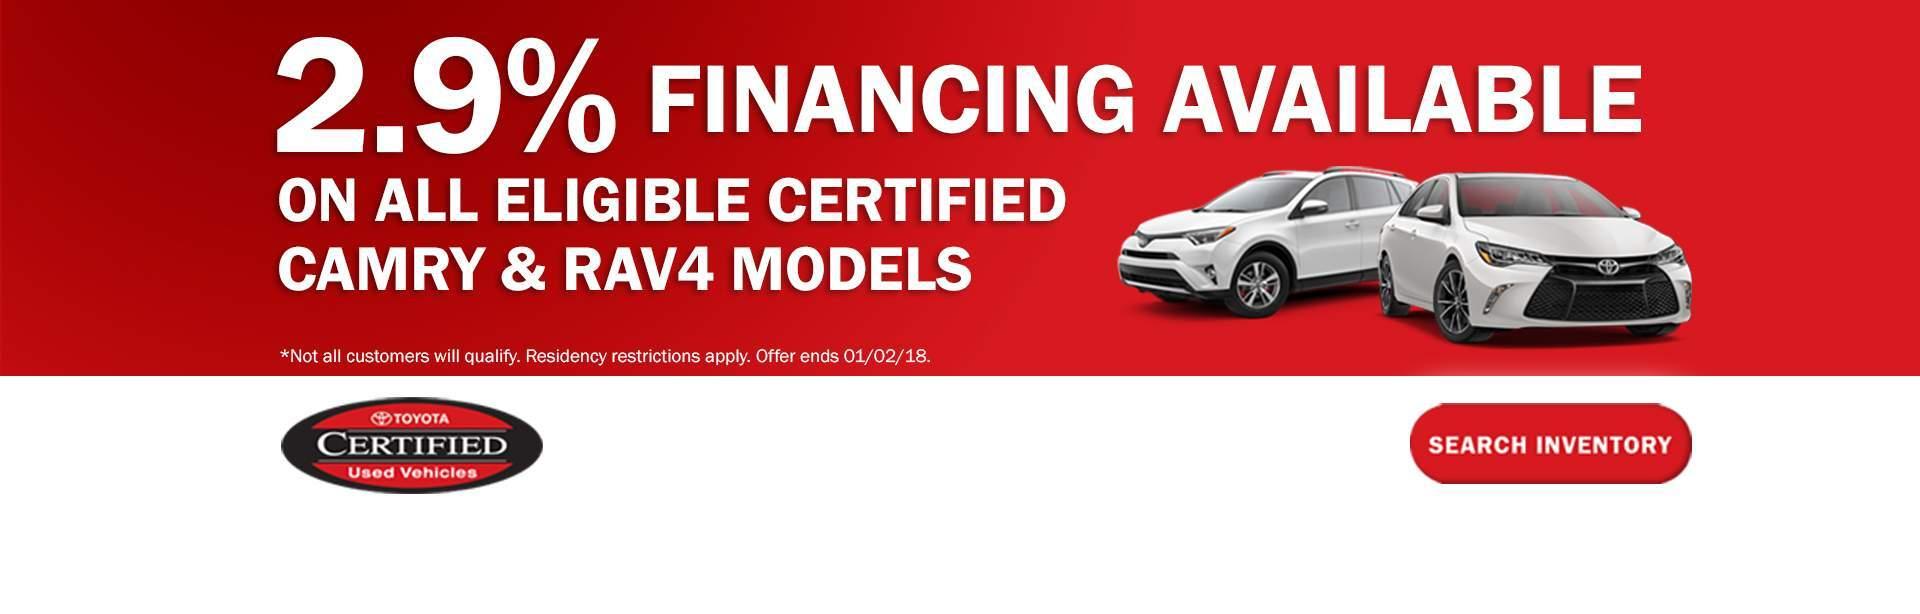 Infiniti Dealership Ny >> Toyota Dealership Cranberry Twp PA | Used Cars Baierl Toyota